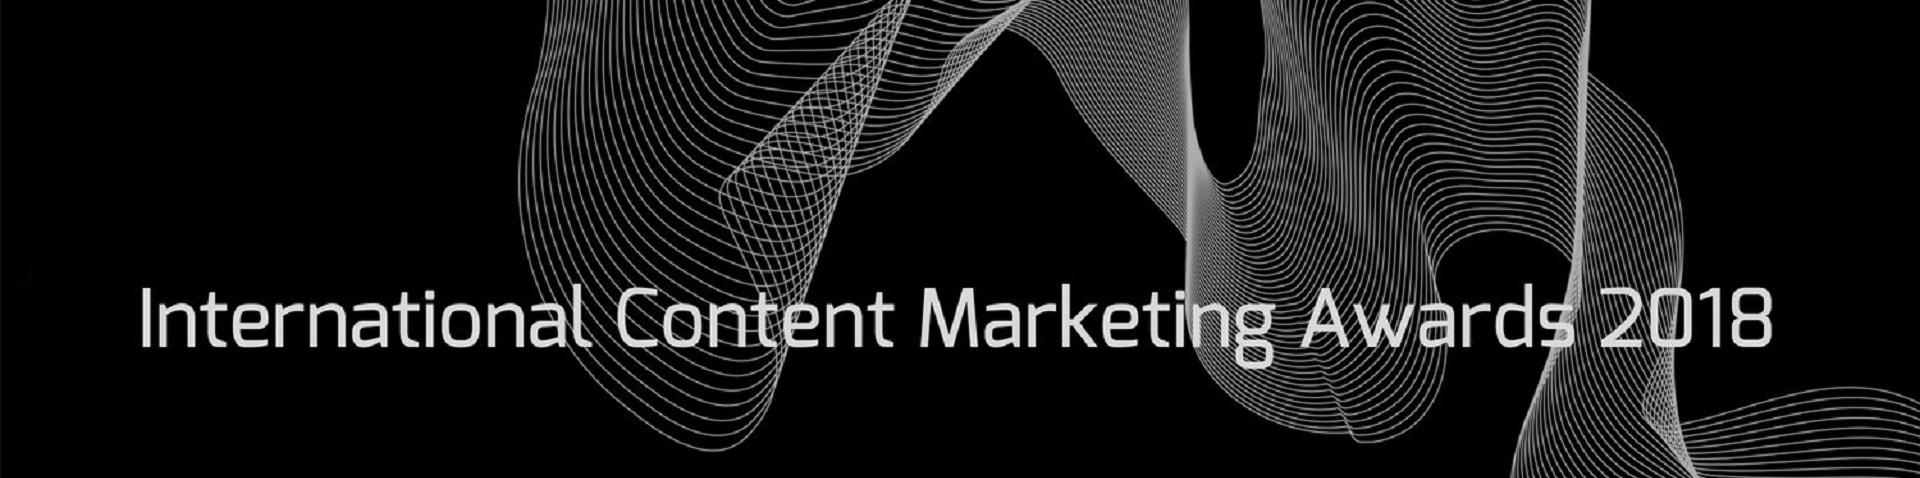 The International Content Marketing Awards